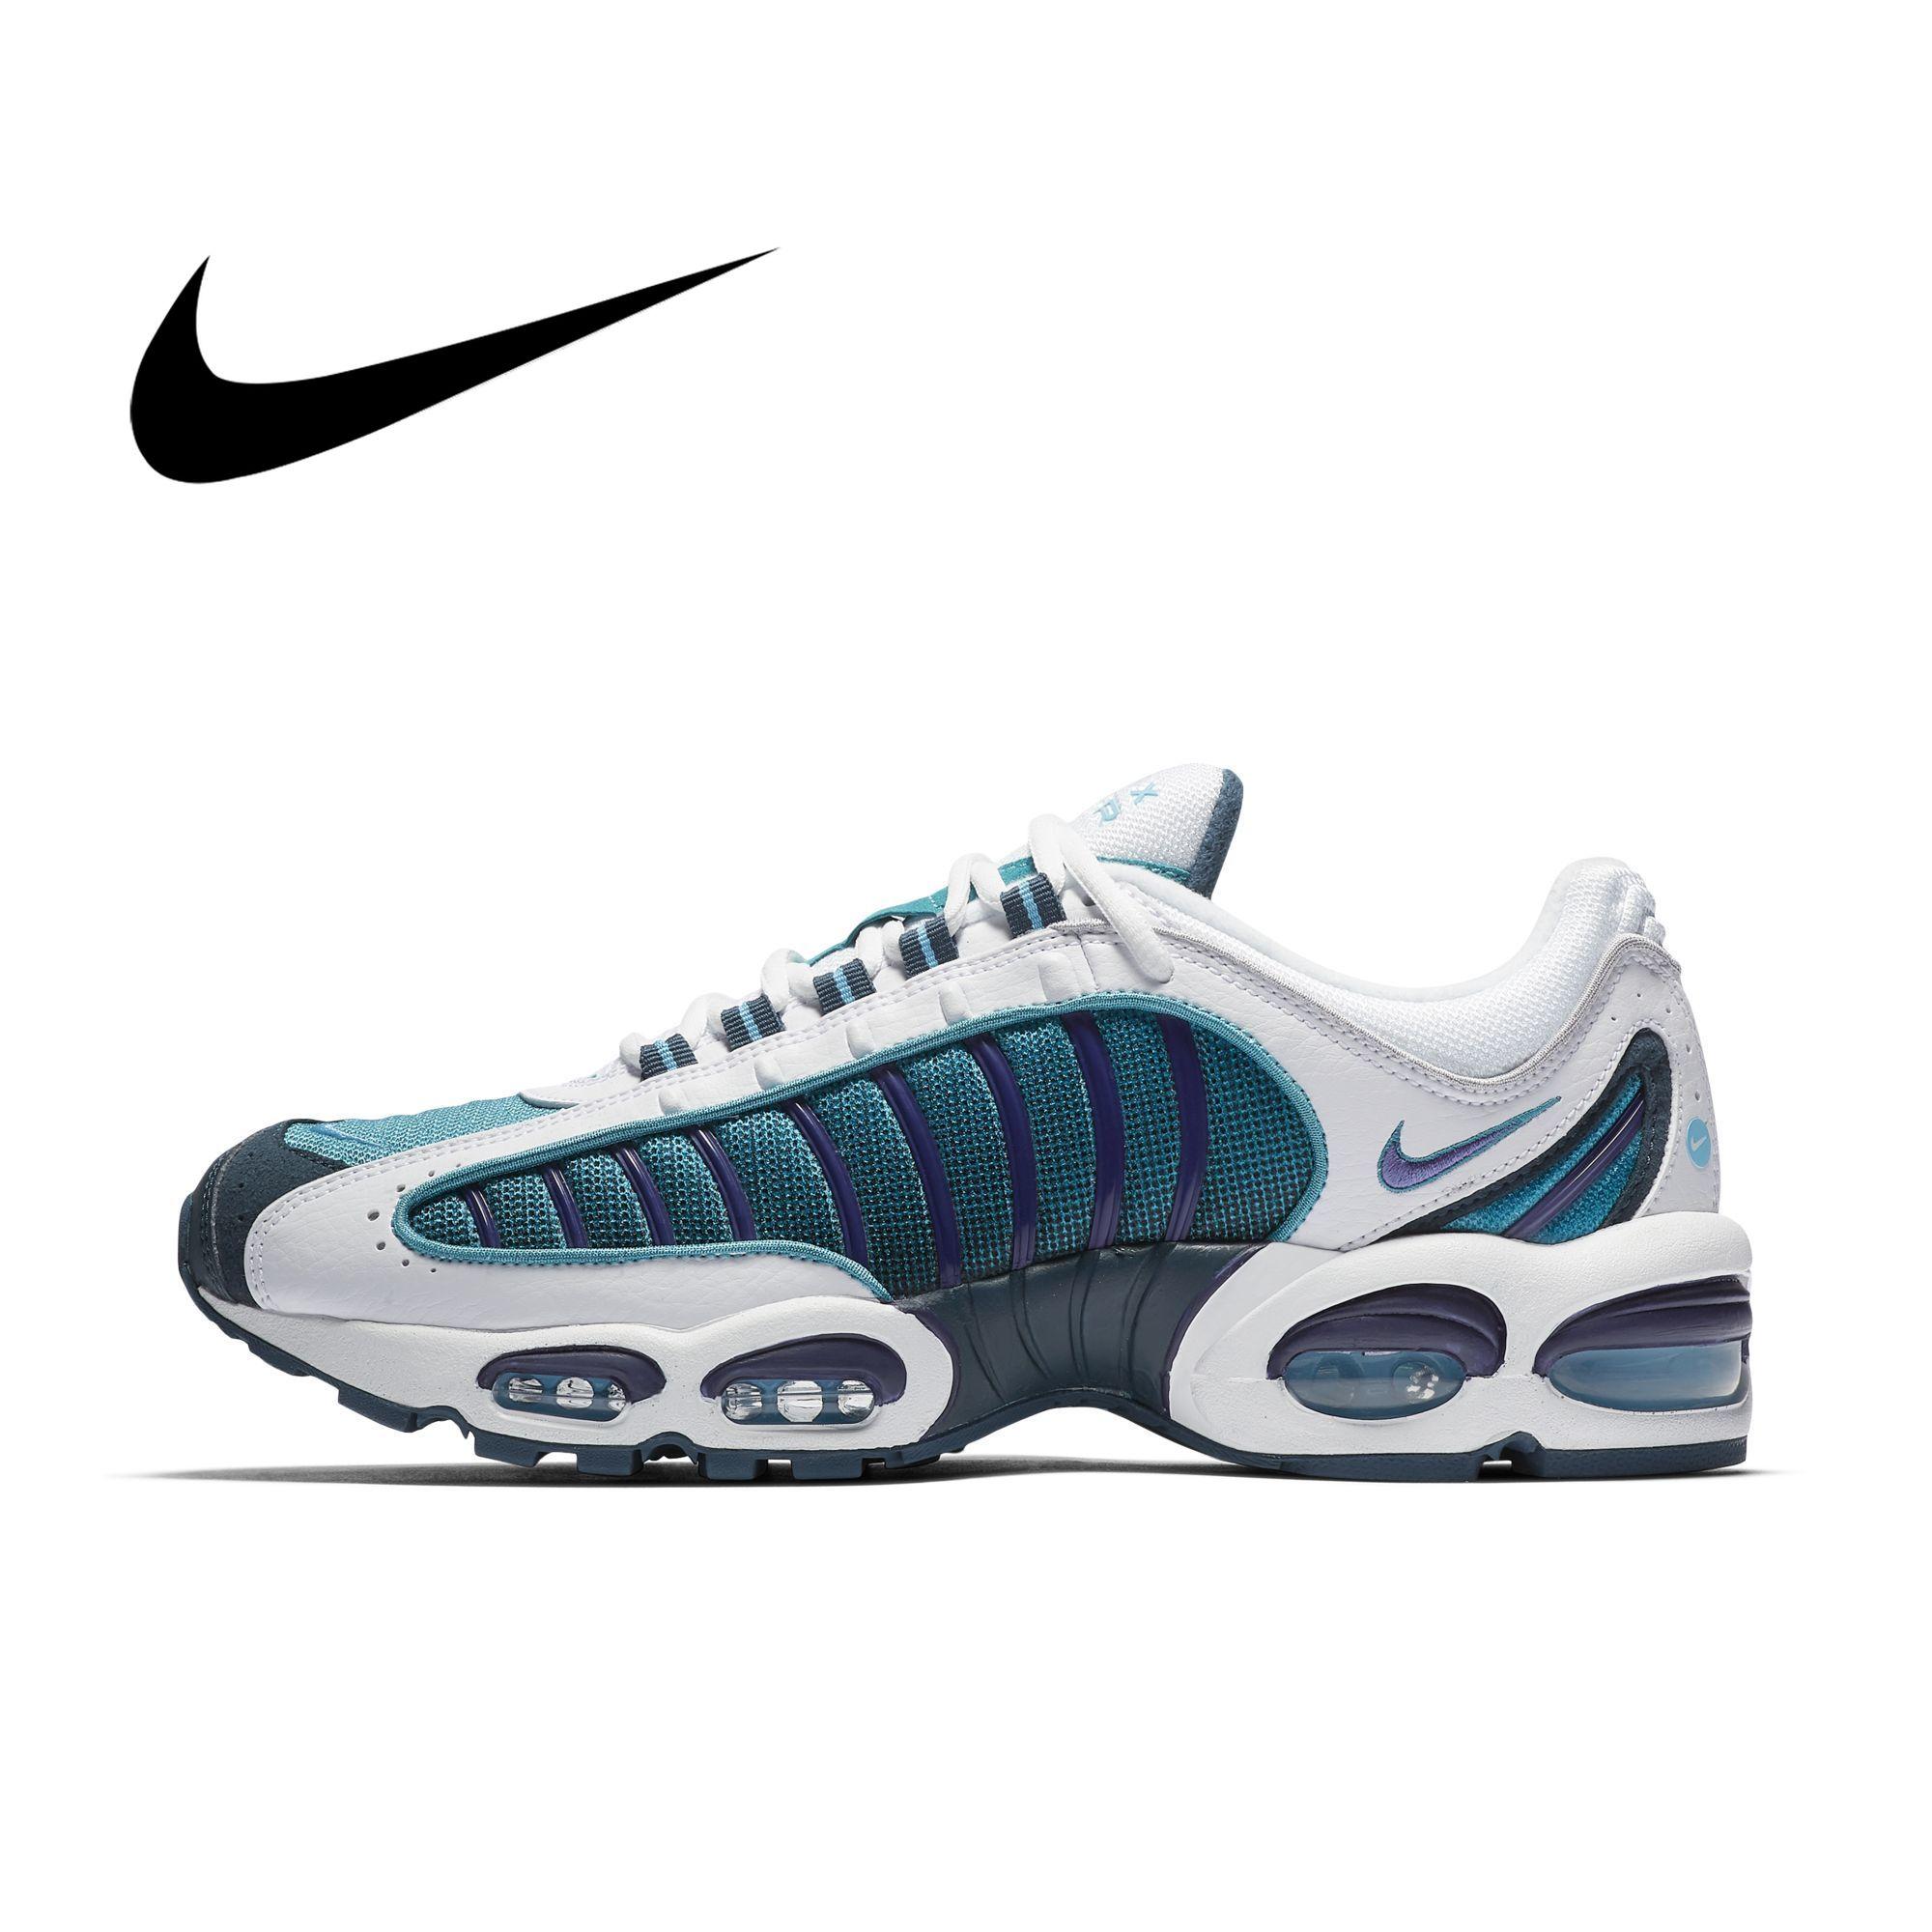 NIKE AIR MAX TAILWIND IV TN hommes chaussures de course coussin d'air respirant Sports de plein Air baskets athlétique Designer chaussures AQ2567